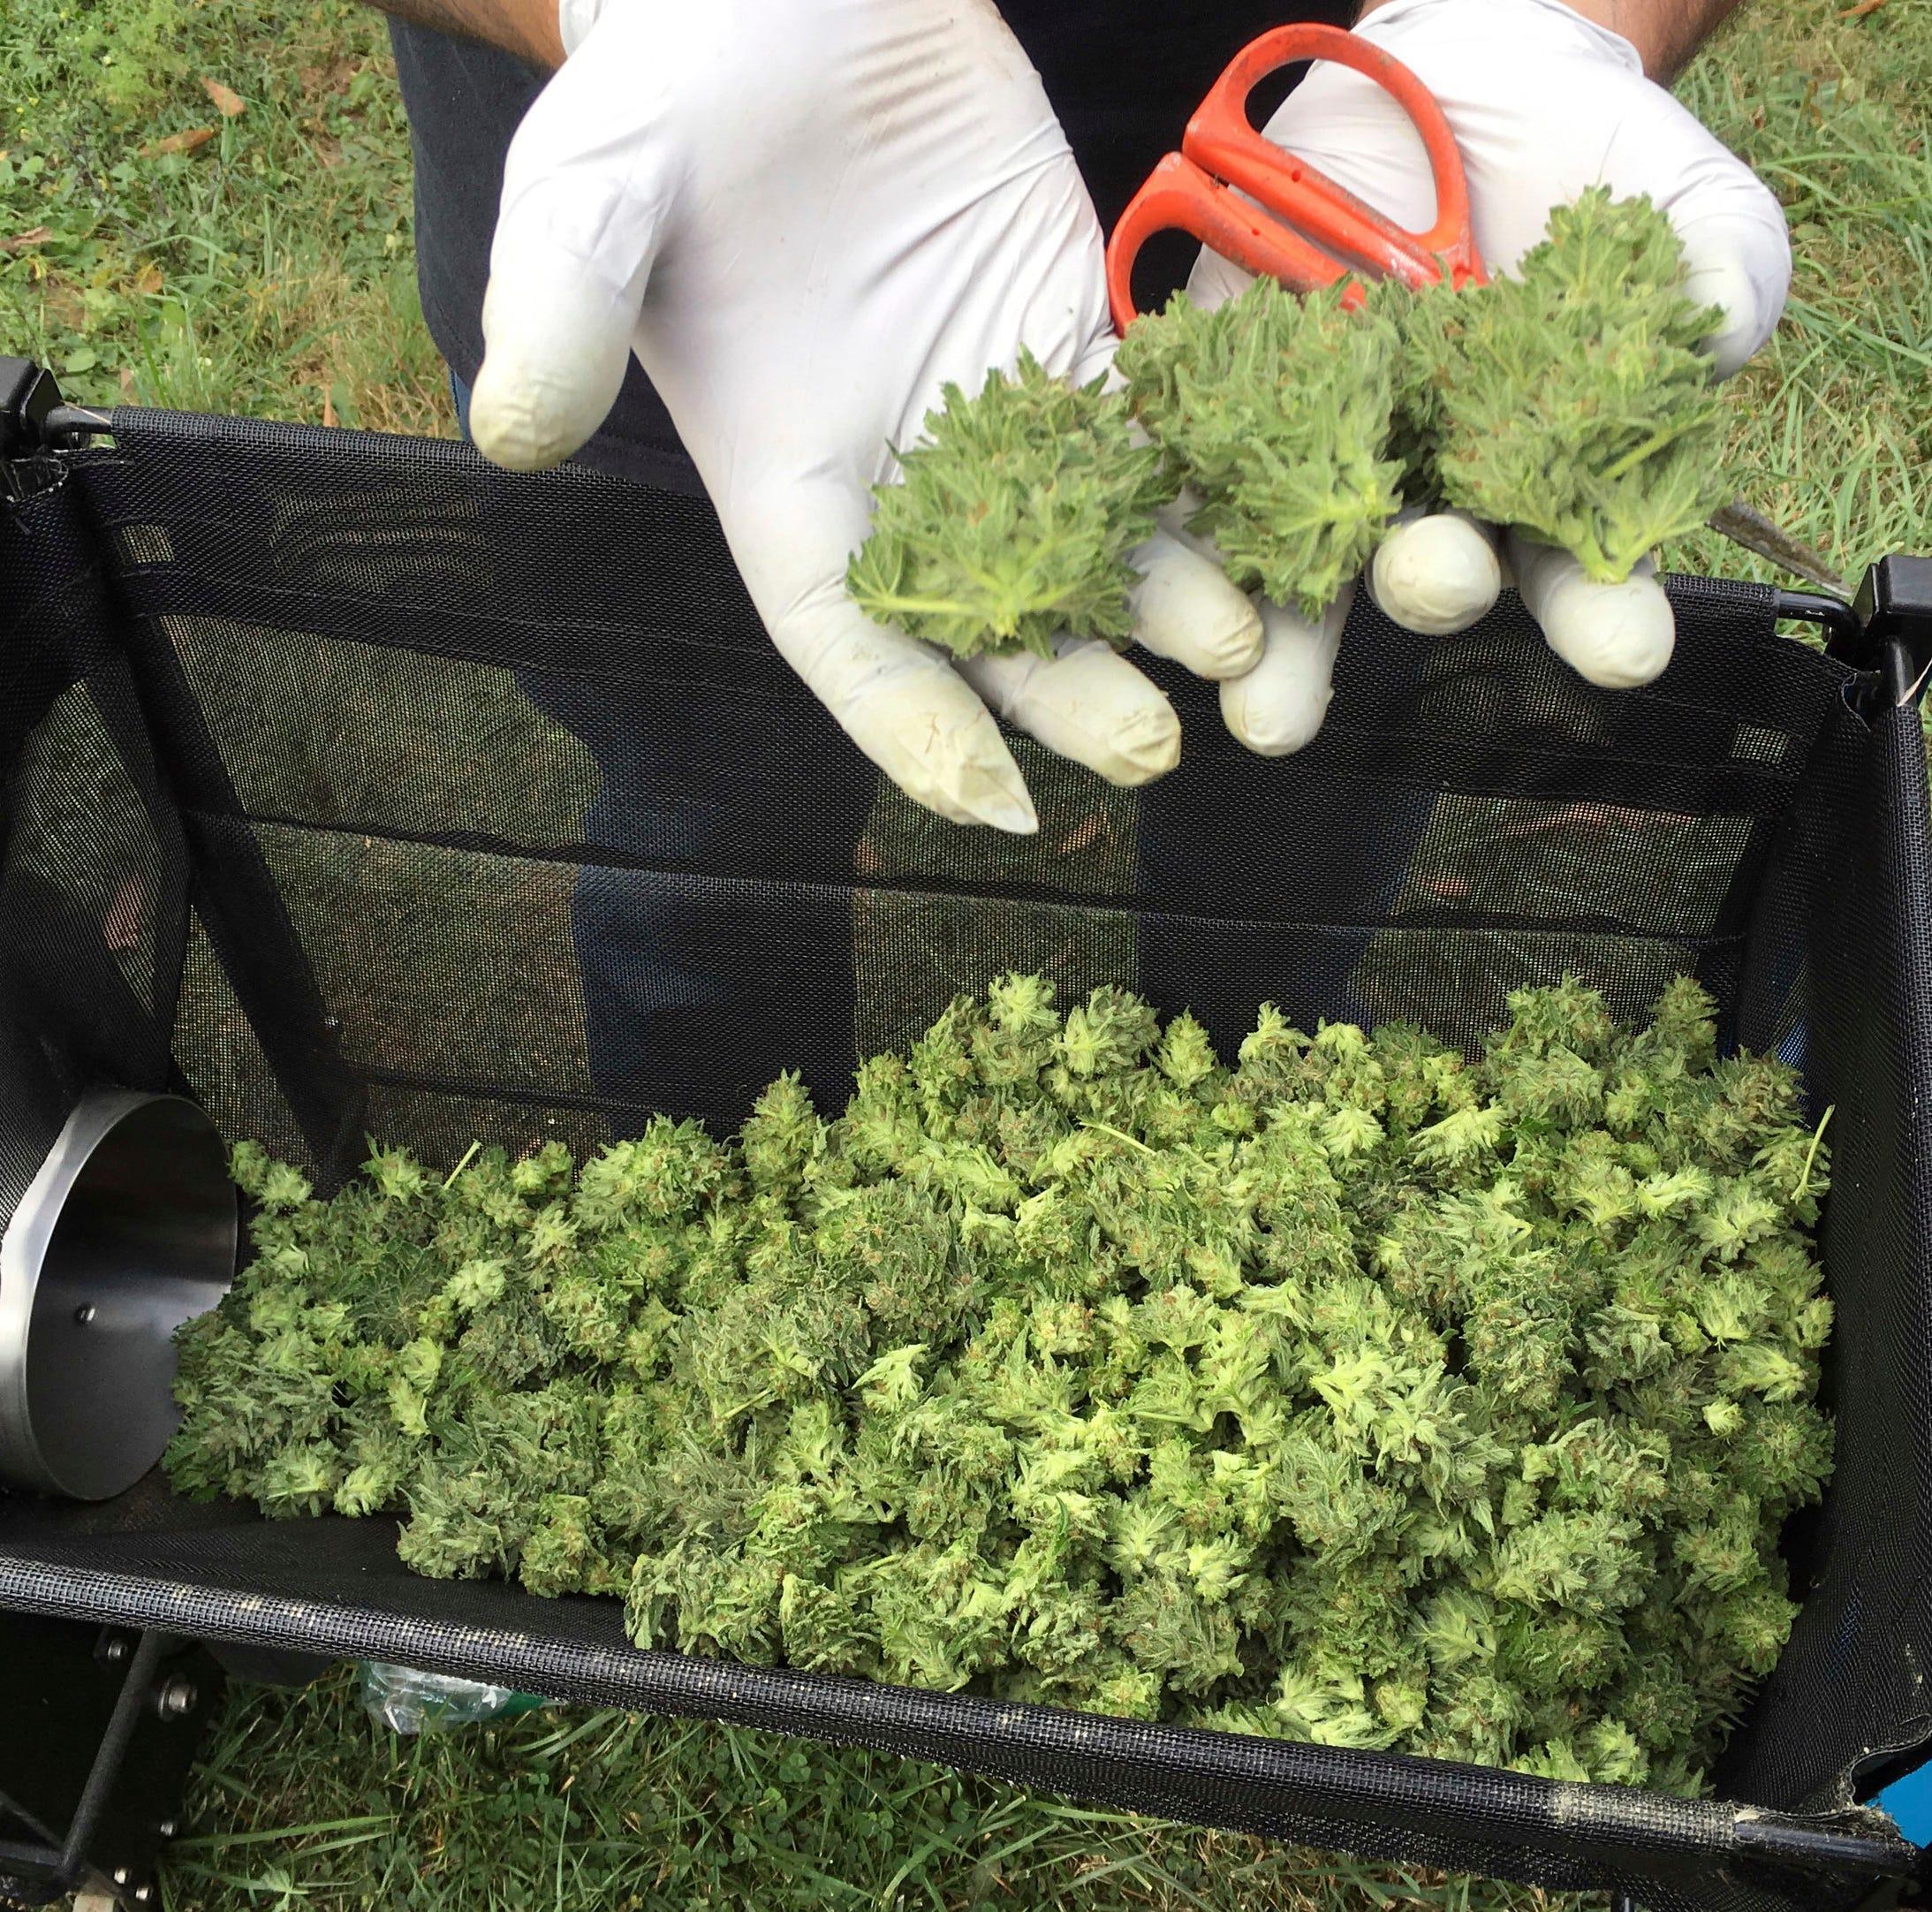 A marijuana harvester examines buds from a trimming machine near Corvallis, Oregon.